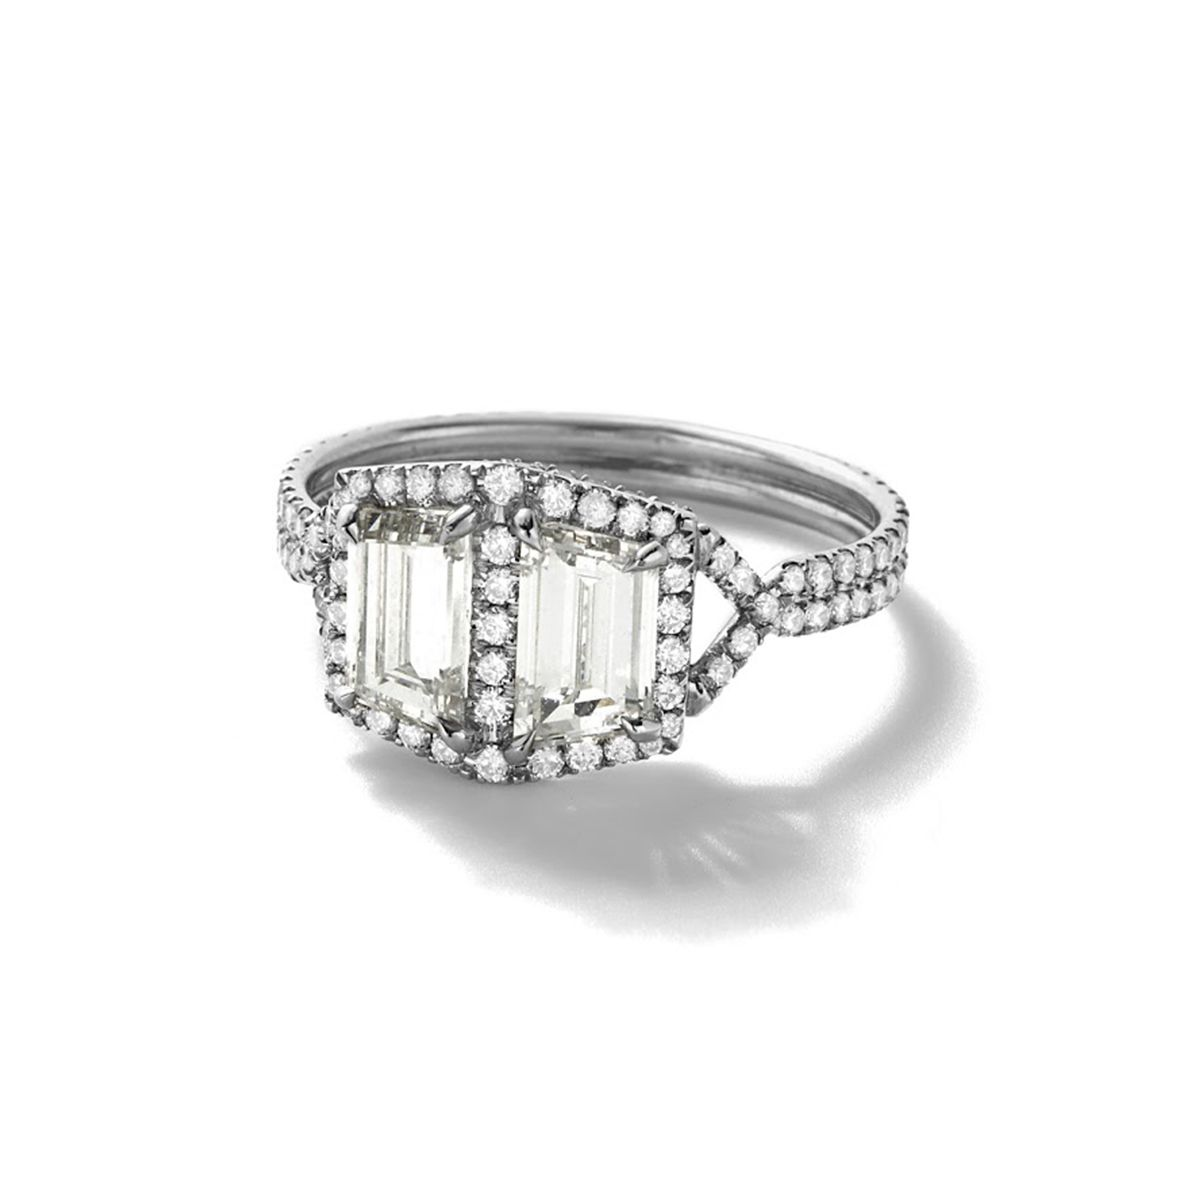 Monique Péan MNRACD526P Two Antique Step Cut Trapezoidal White Diamond Ring